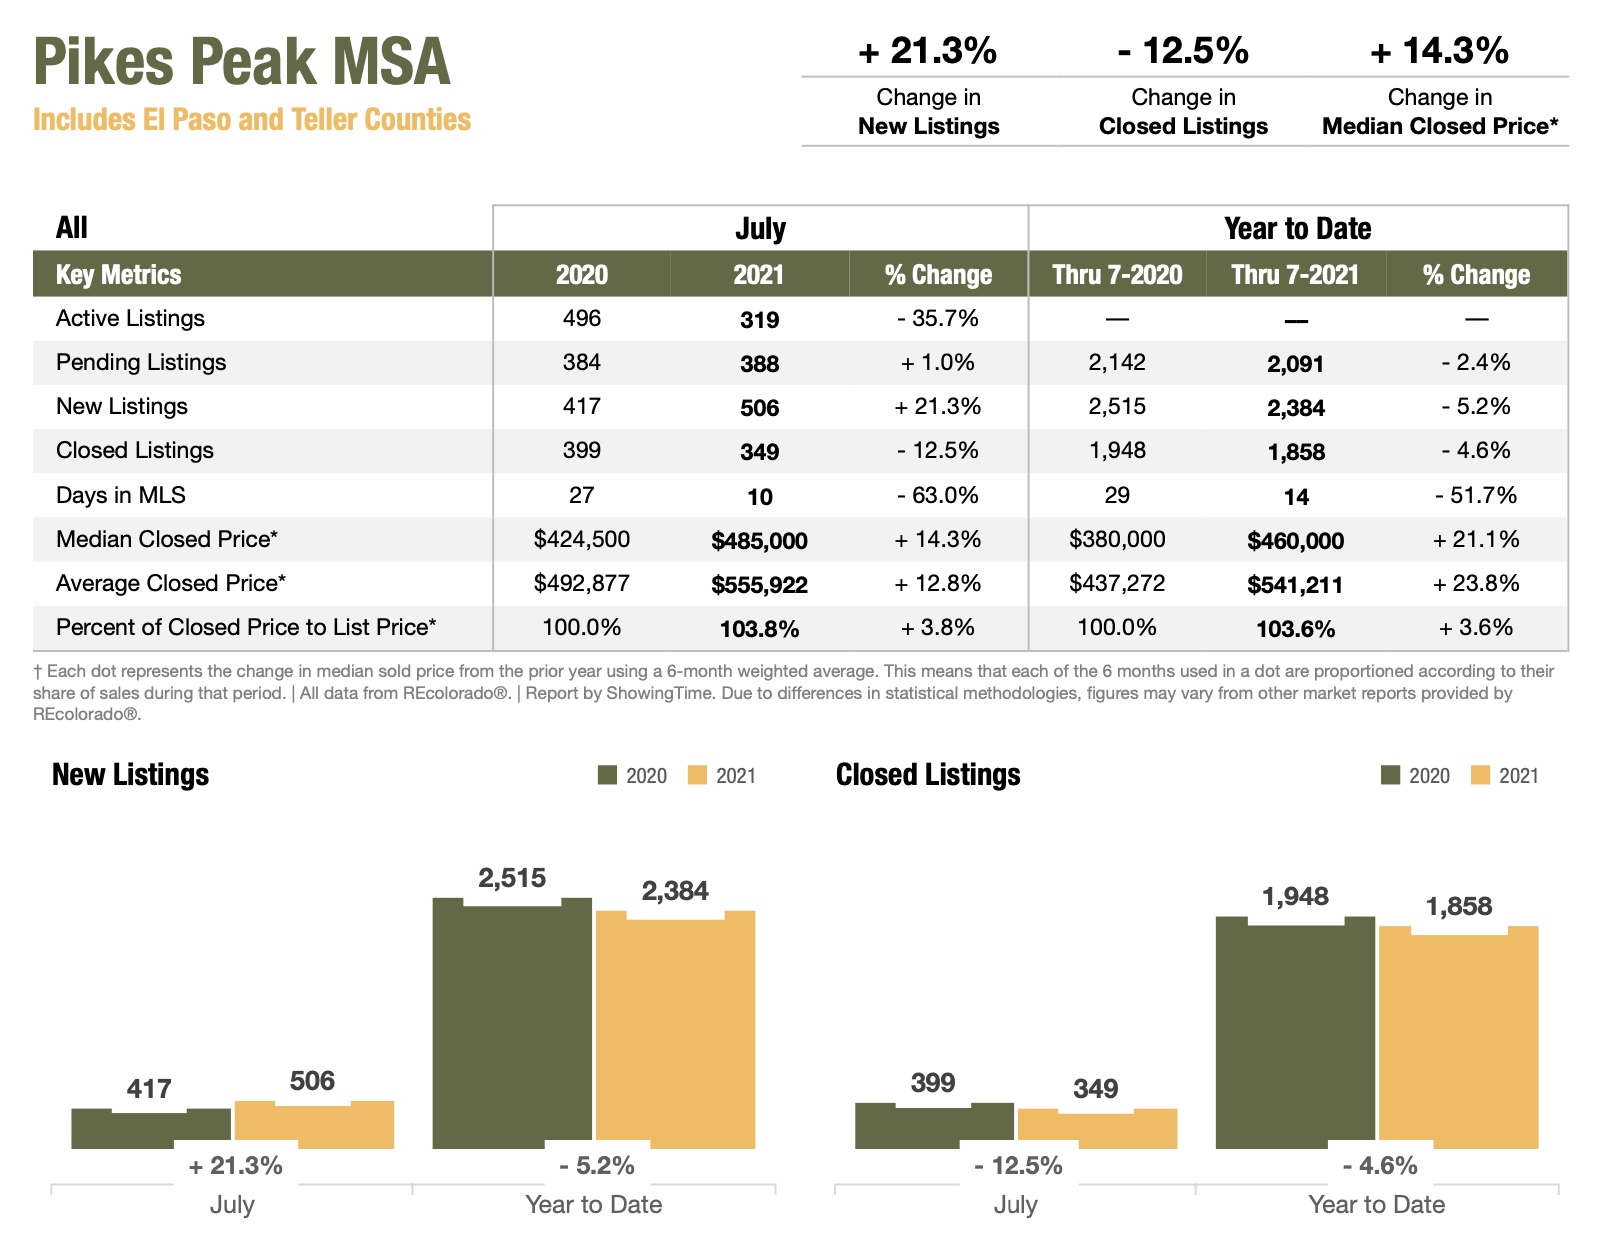 Colorado Real Estate Market Report Pikes Peak MSA July 2021